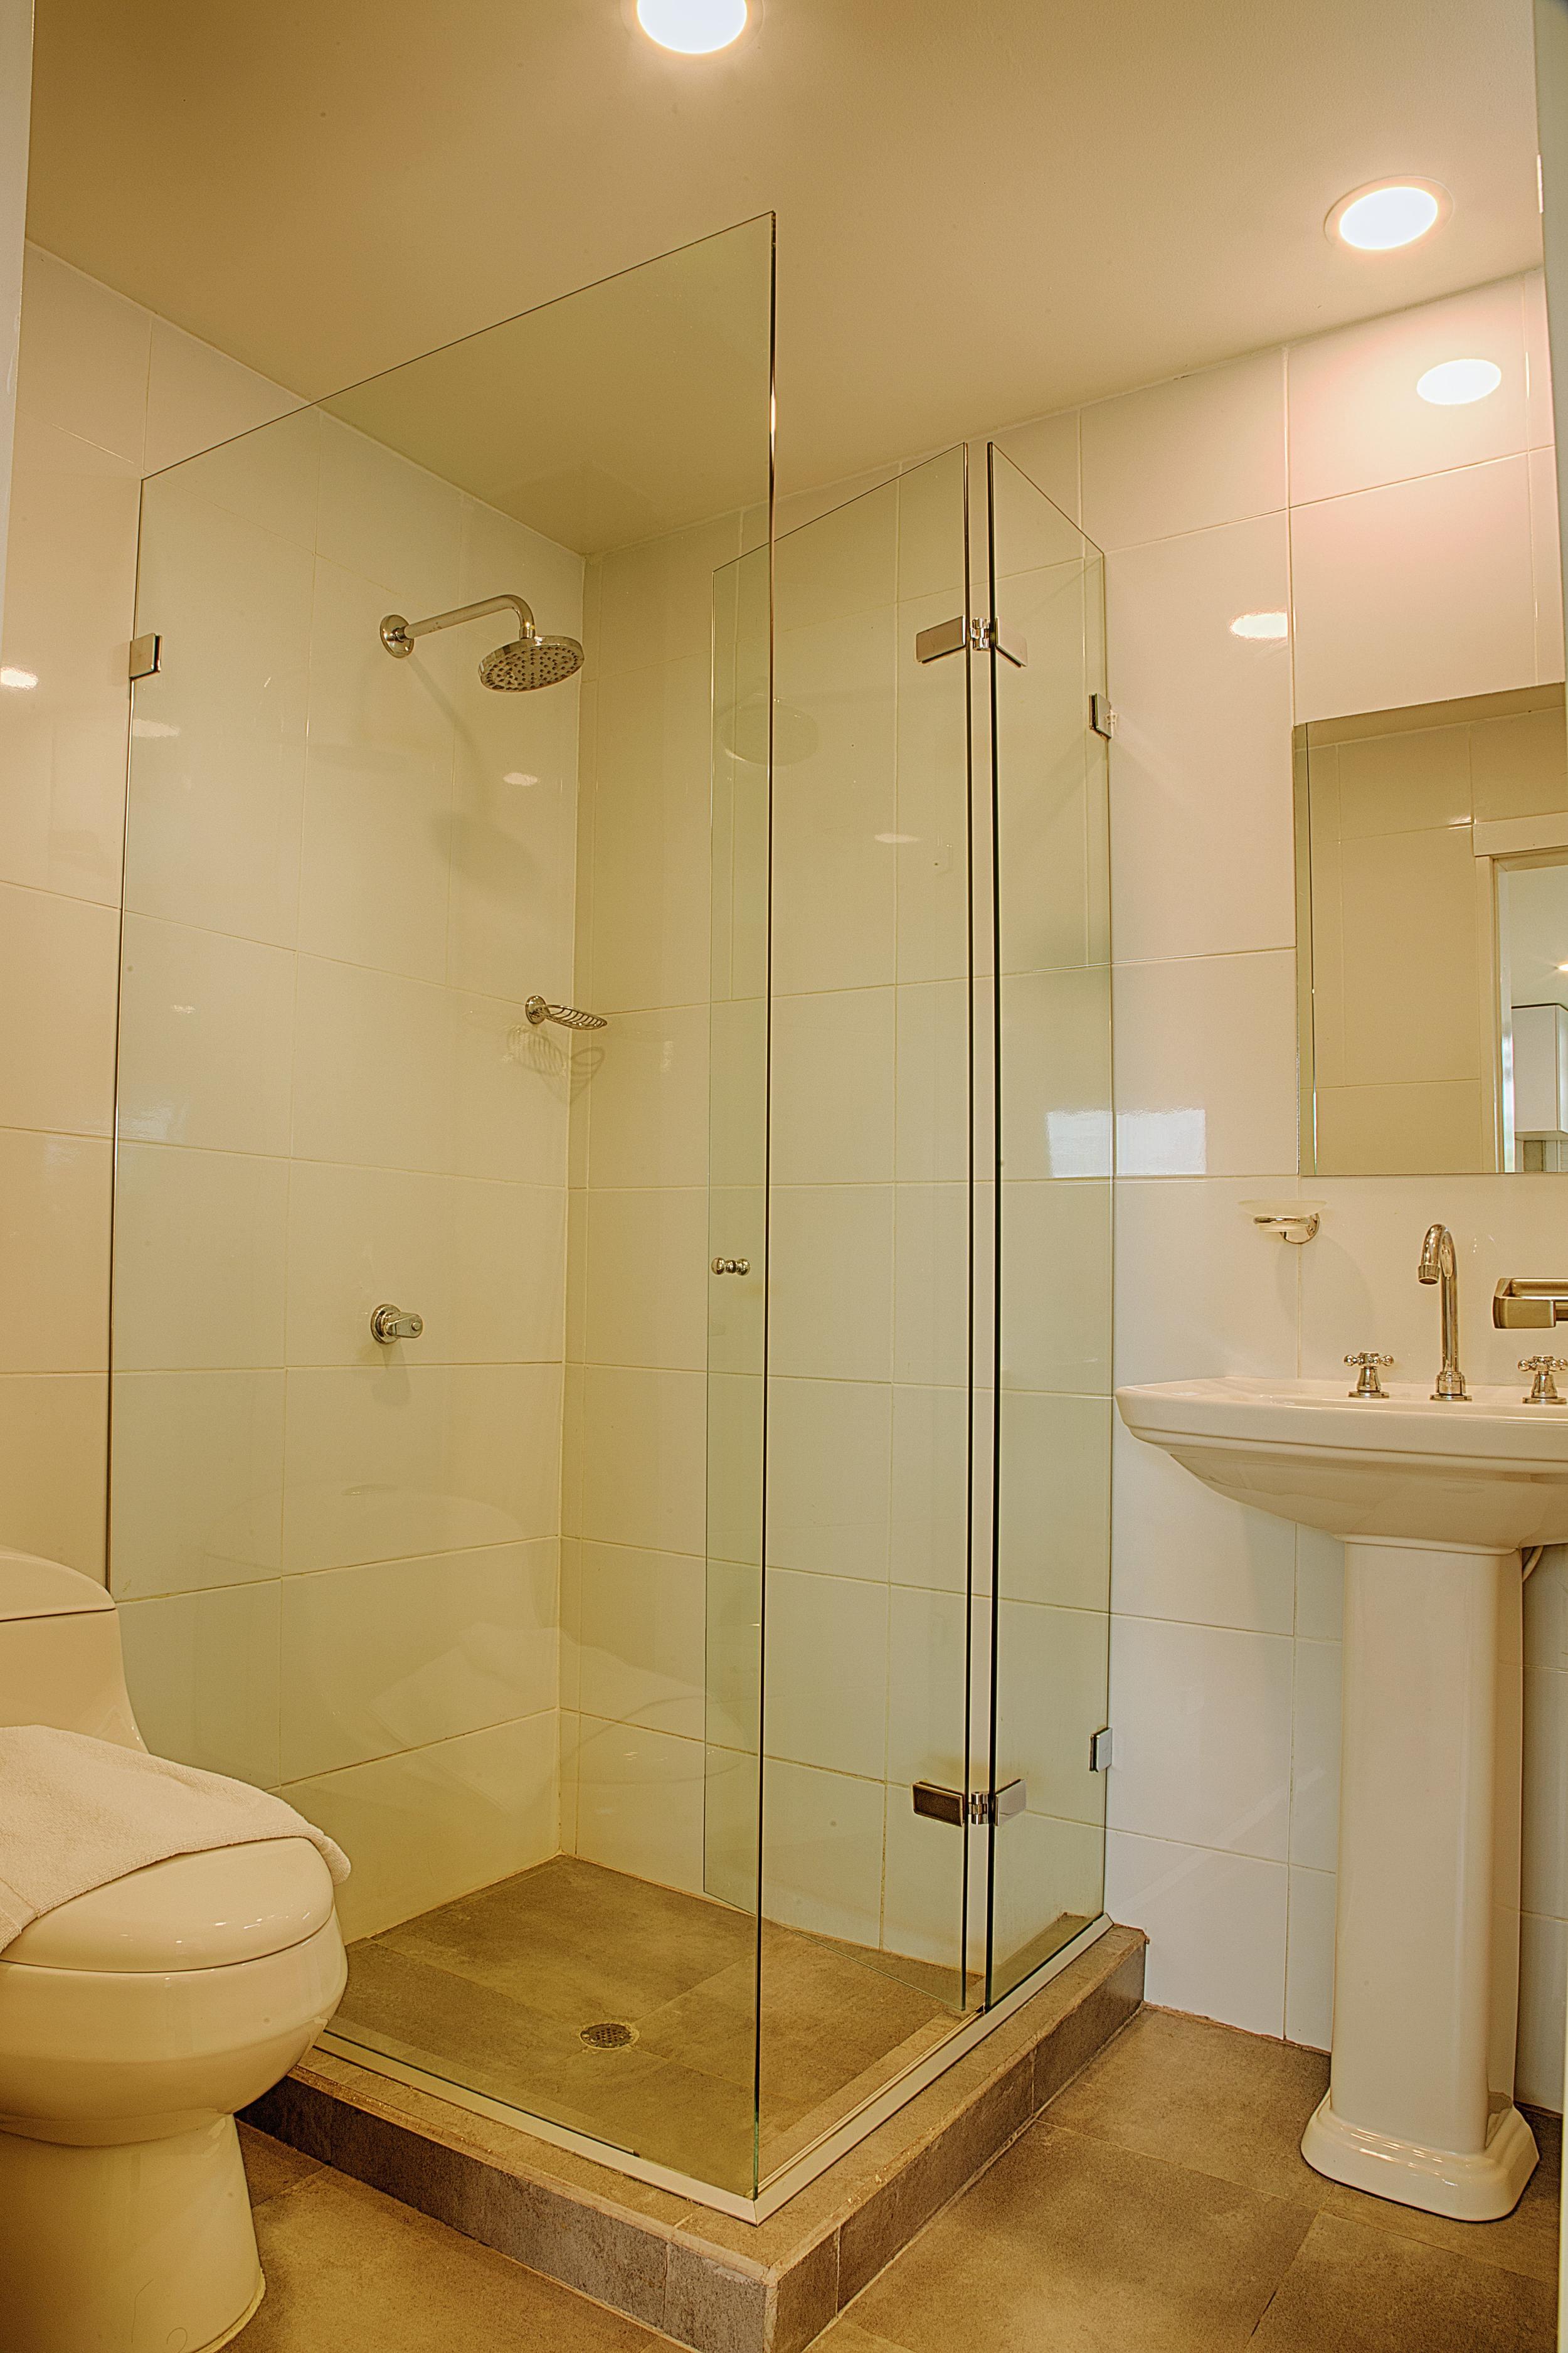 203-Bathroom.jpg